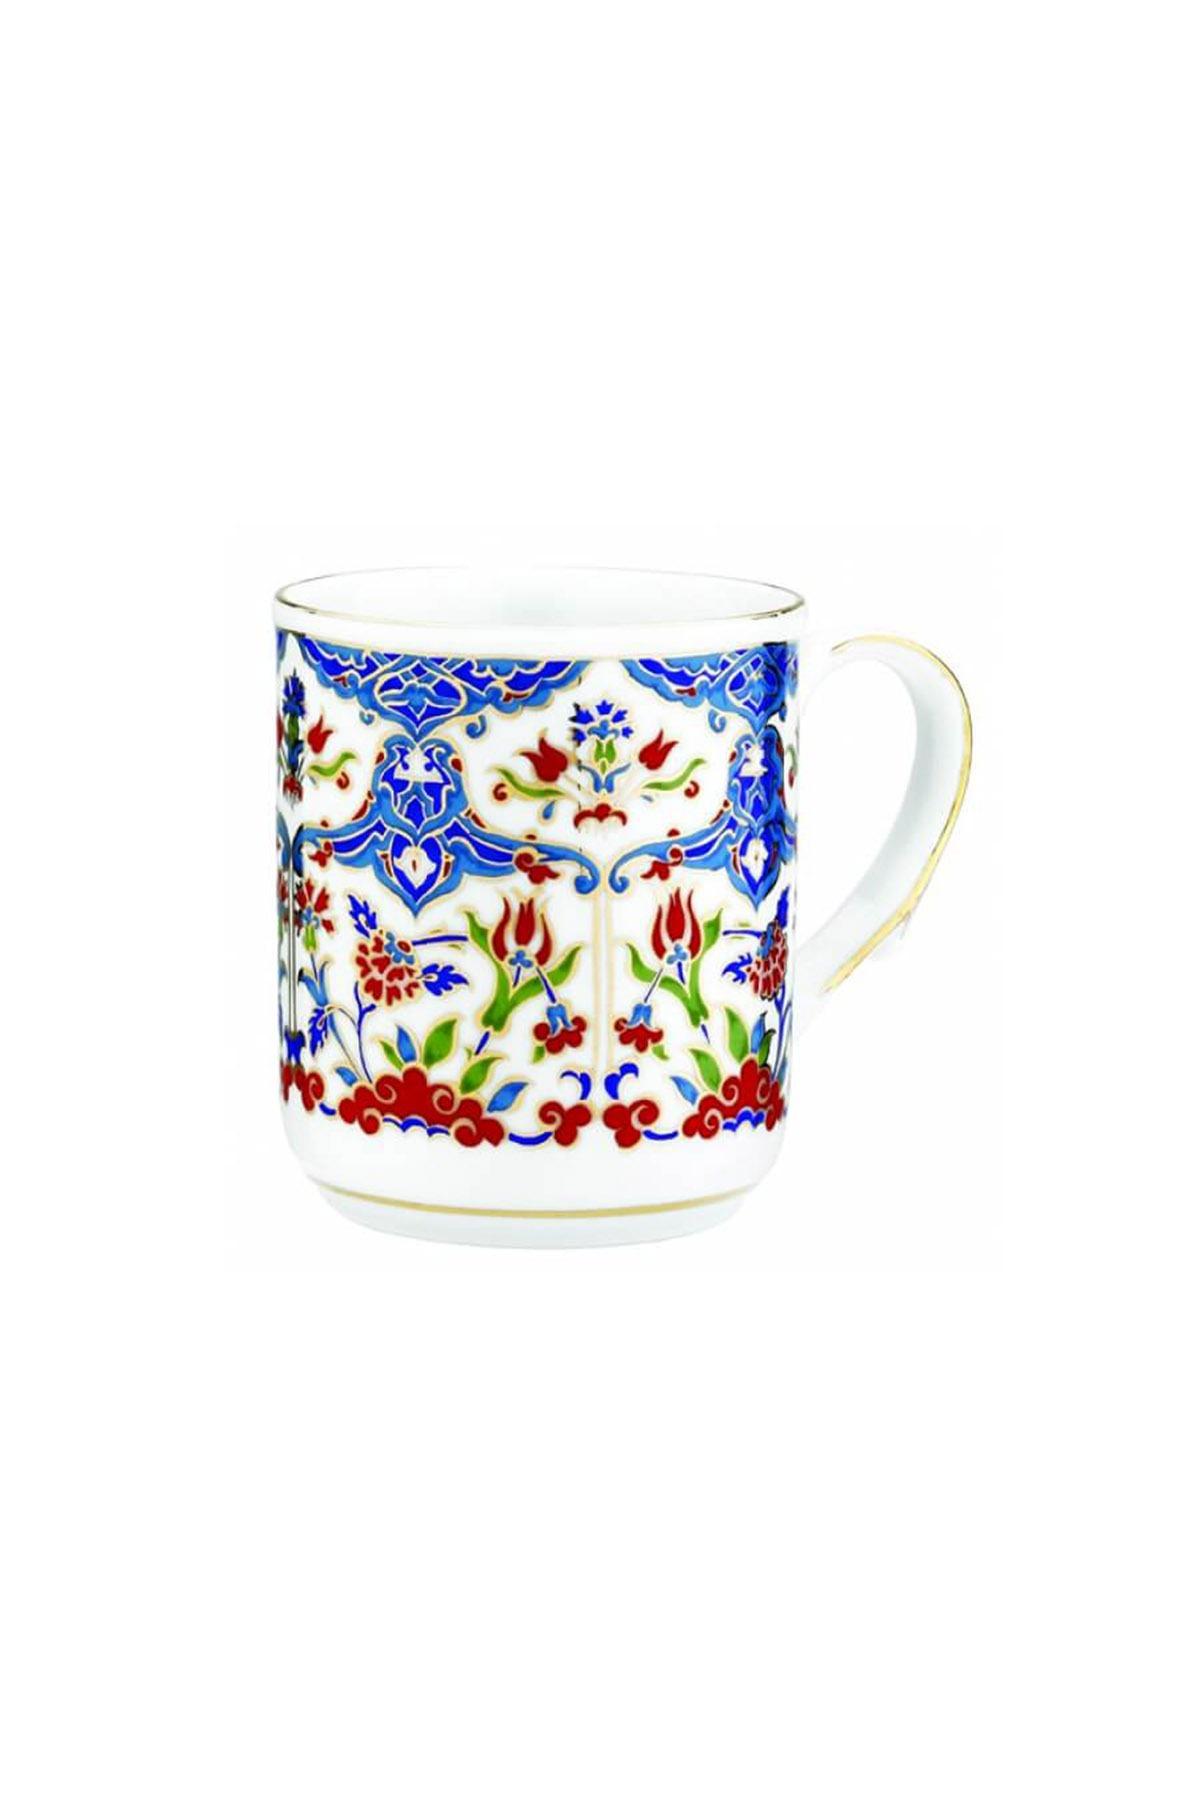 Kütahya Porselen - Kupa Bardak Dekor No:415